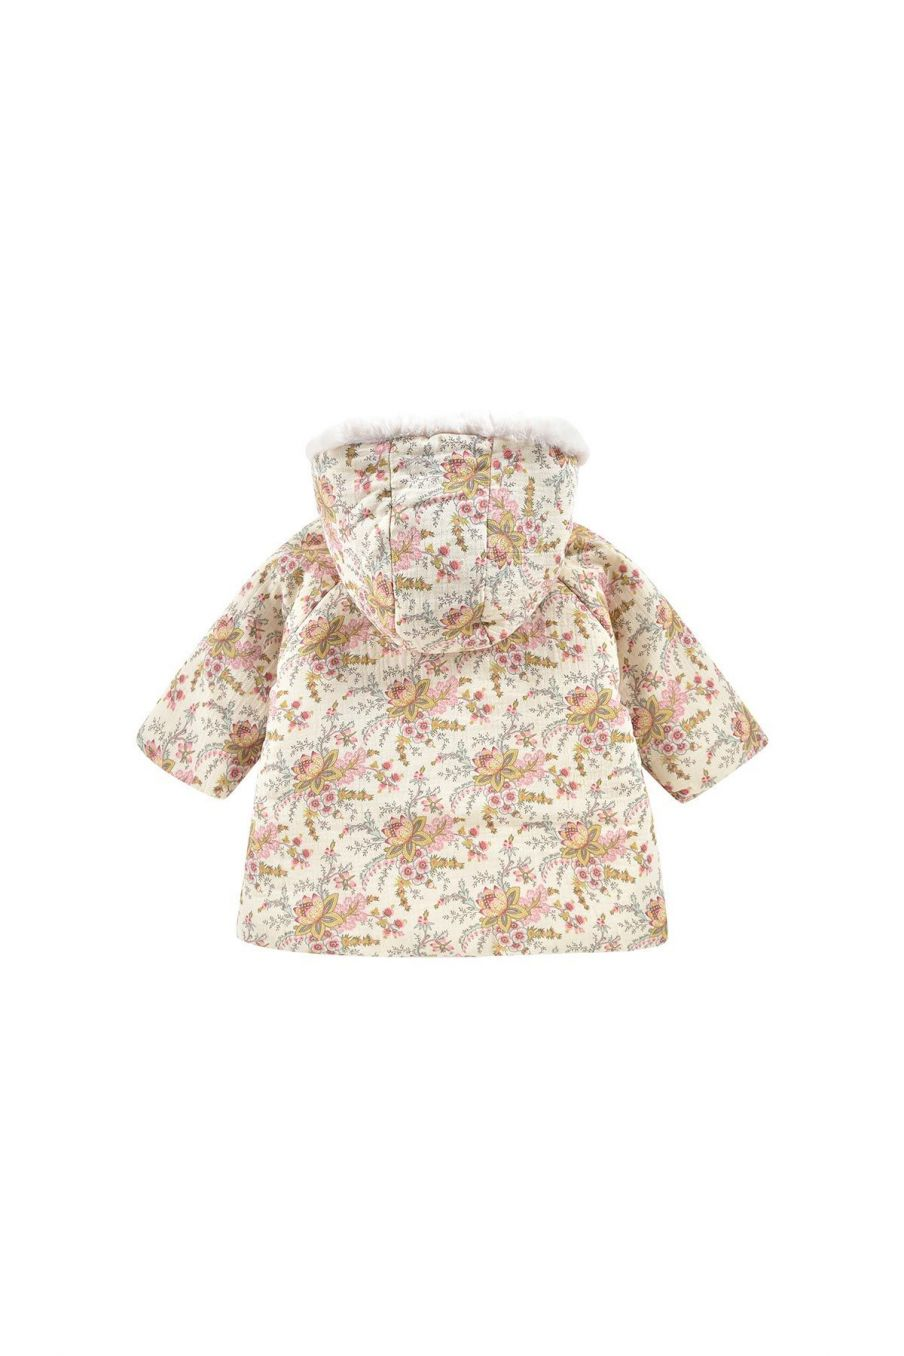 manteau bebe fille bacani cream french flowers - louise misha